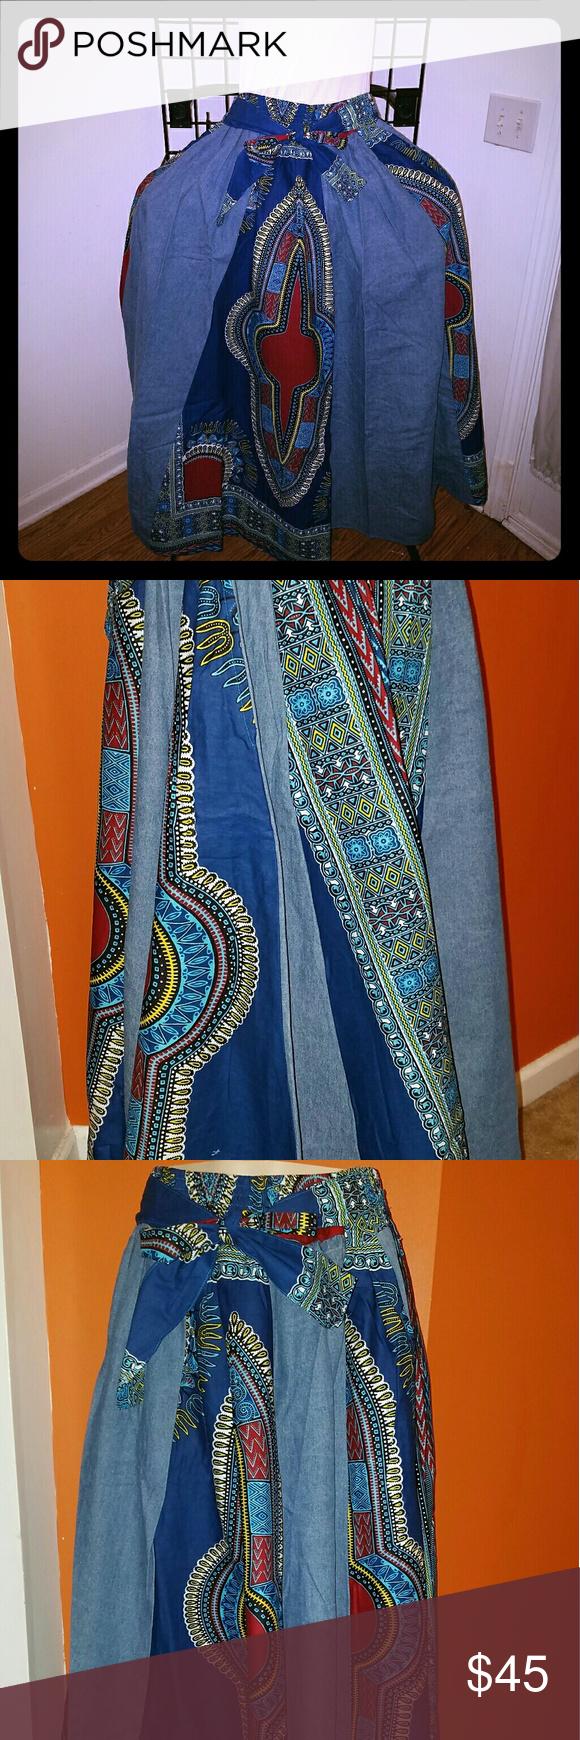 Denim African Print Skirt 100% cotton Denim like fabric. One size fits most. Skirts Maxi